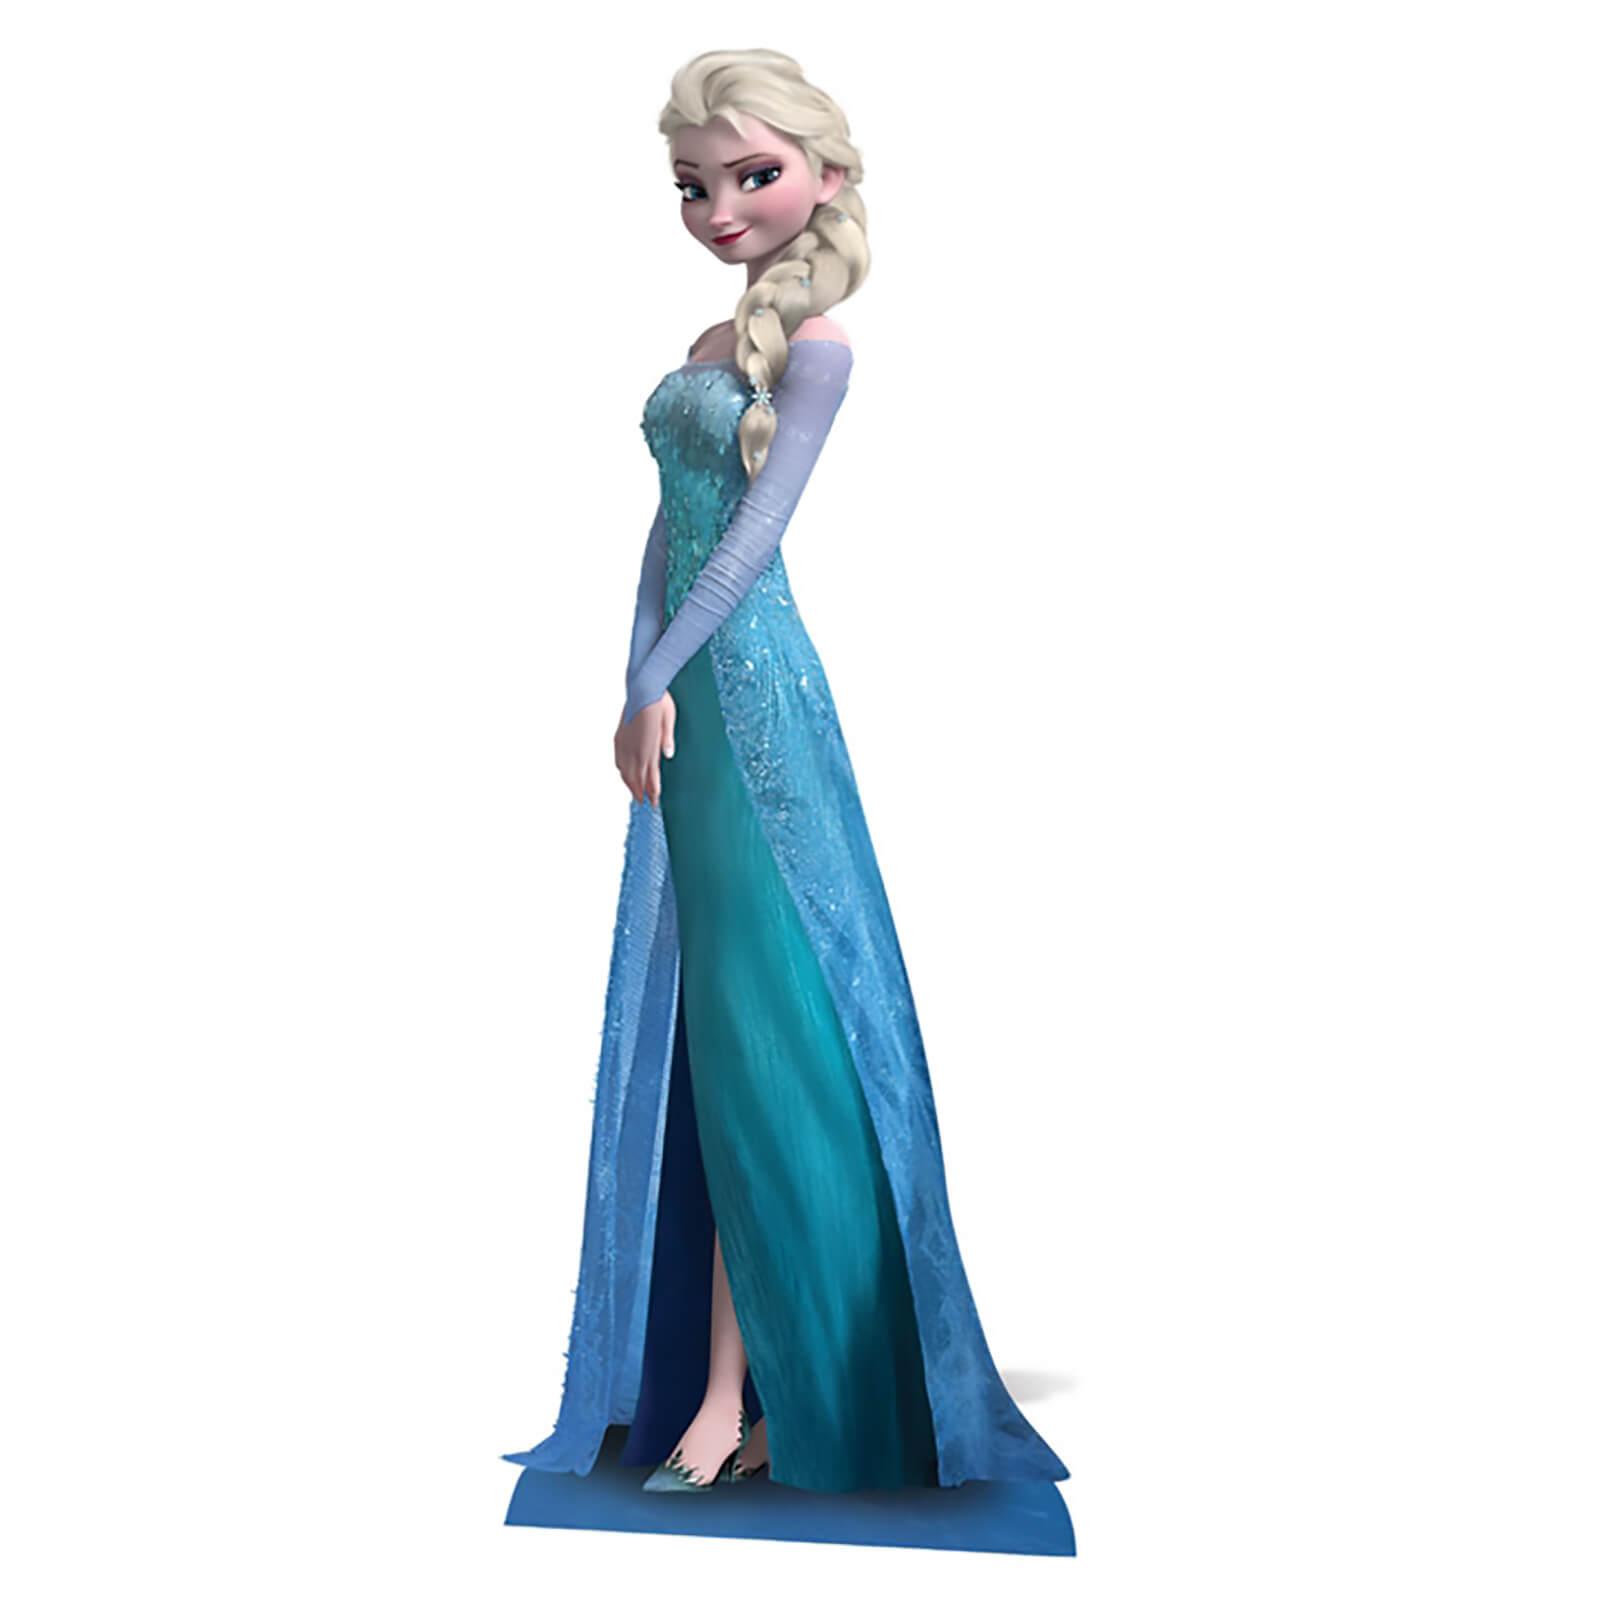 Image of Disney Frozen Elsa Mini Cardboard Cut Out